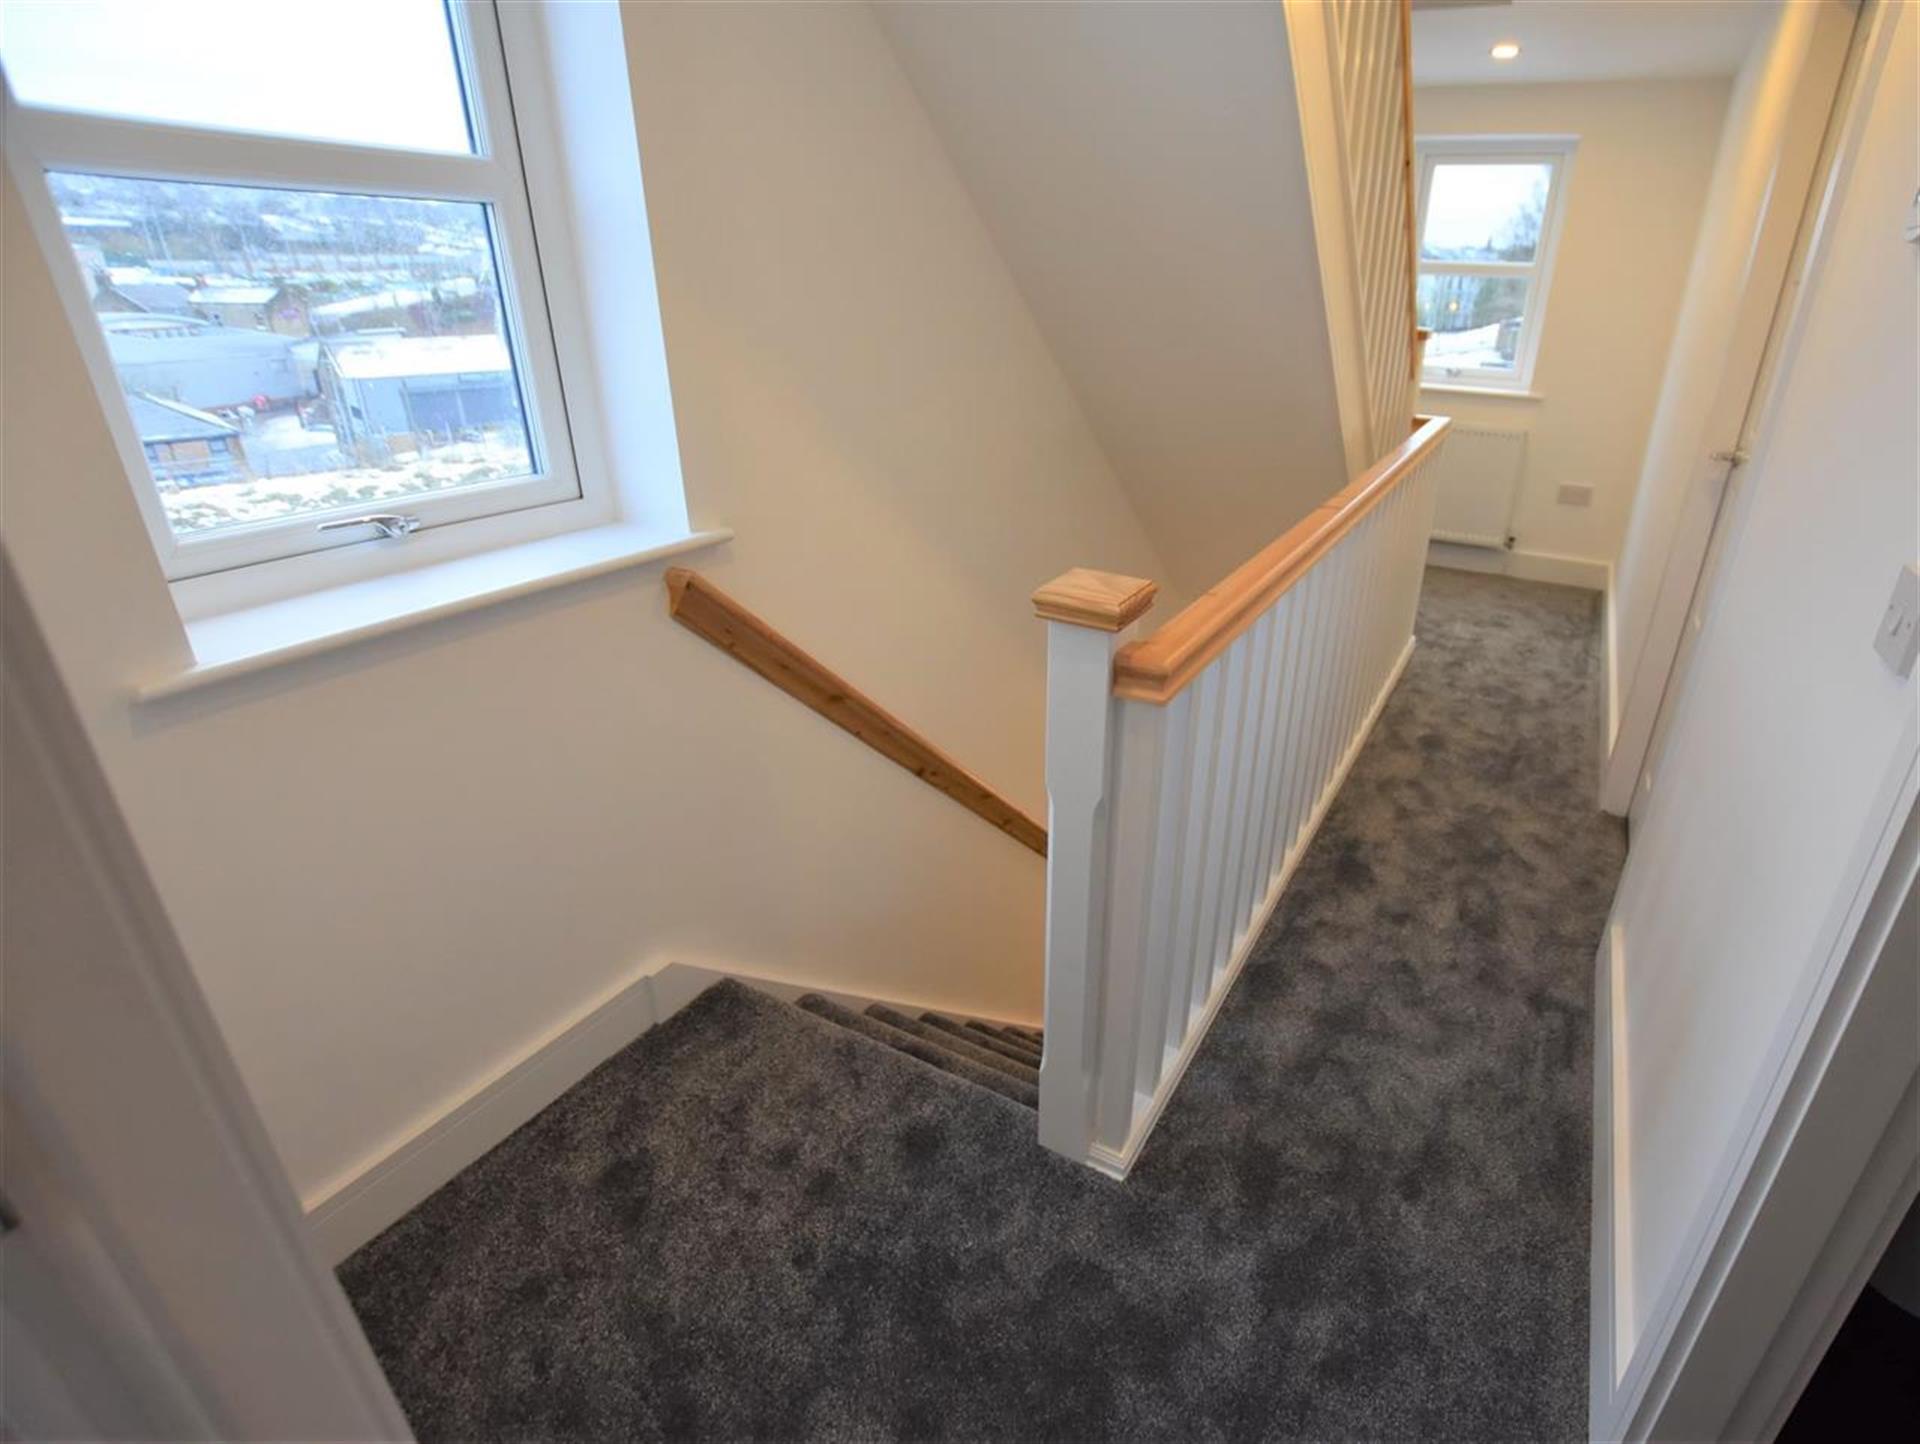 3 Bedroom House For Sale - Hallway